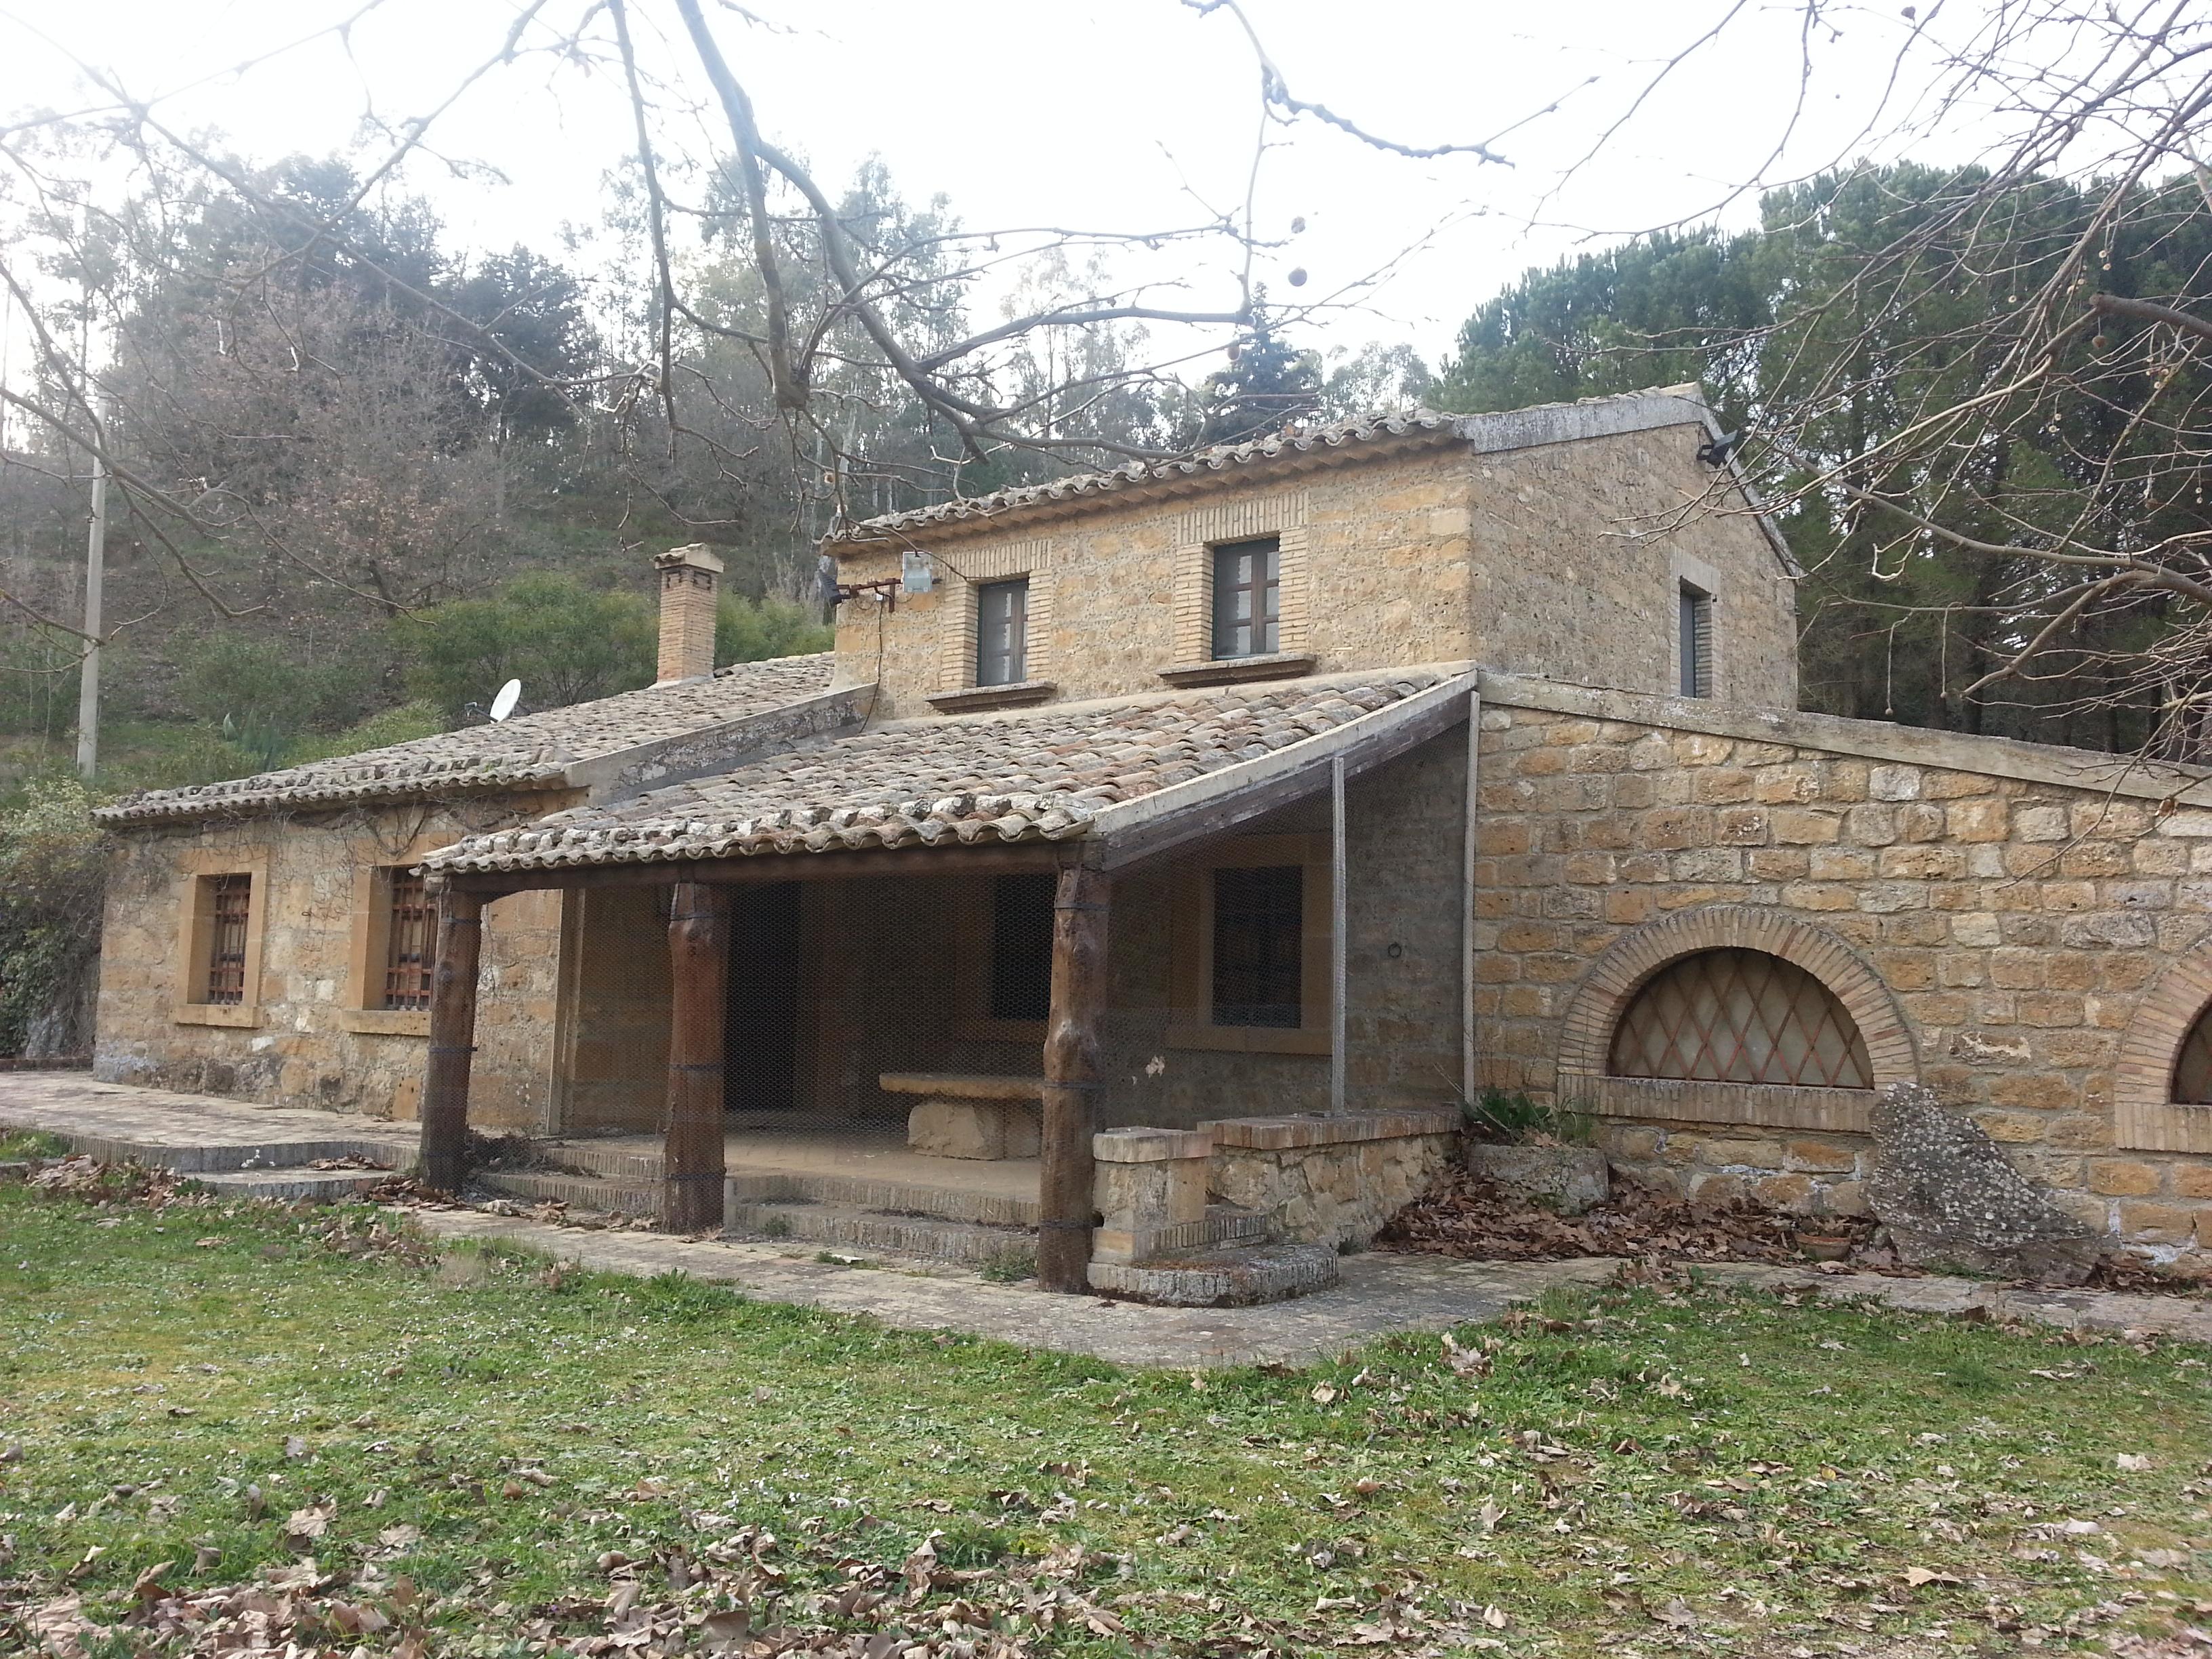 Venta Casa solariega, Enna, Enna, Italia, strada statale ...